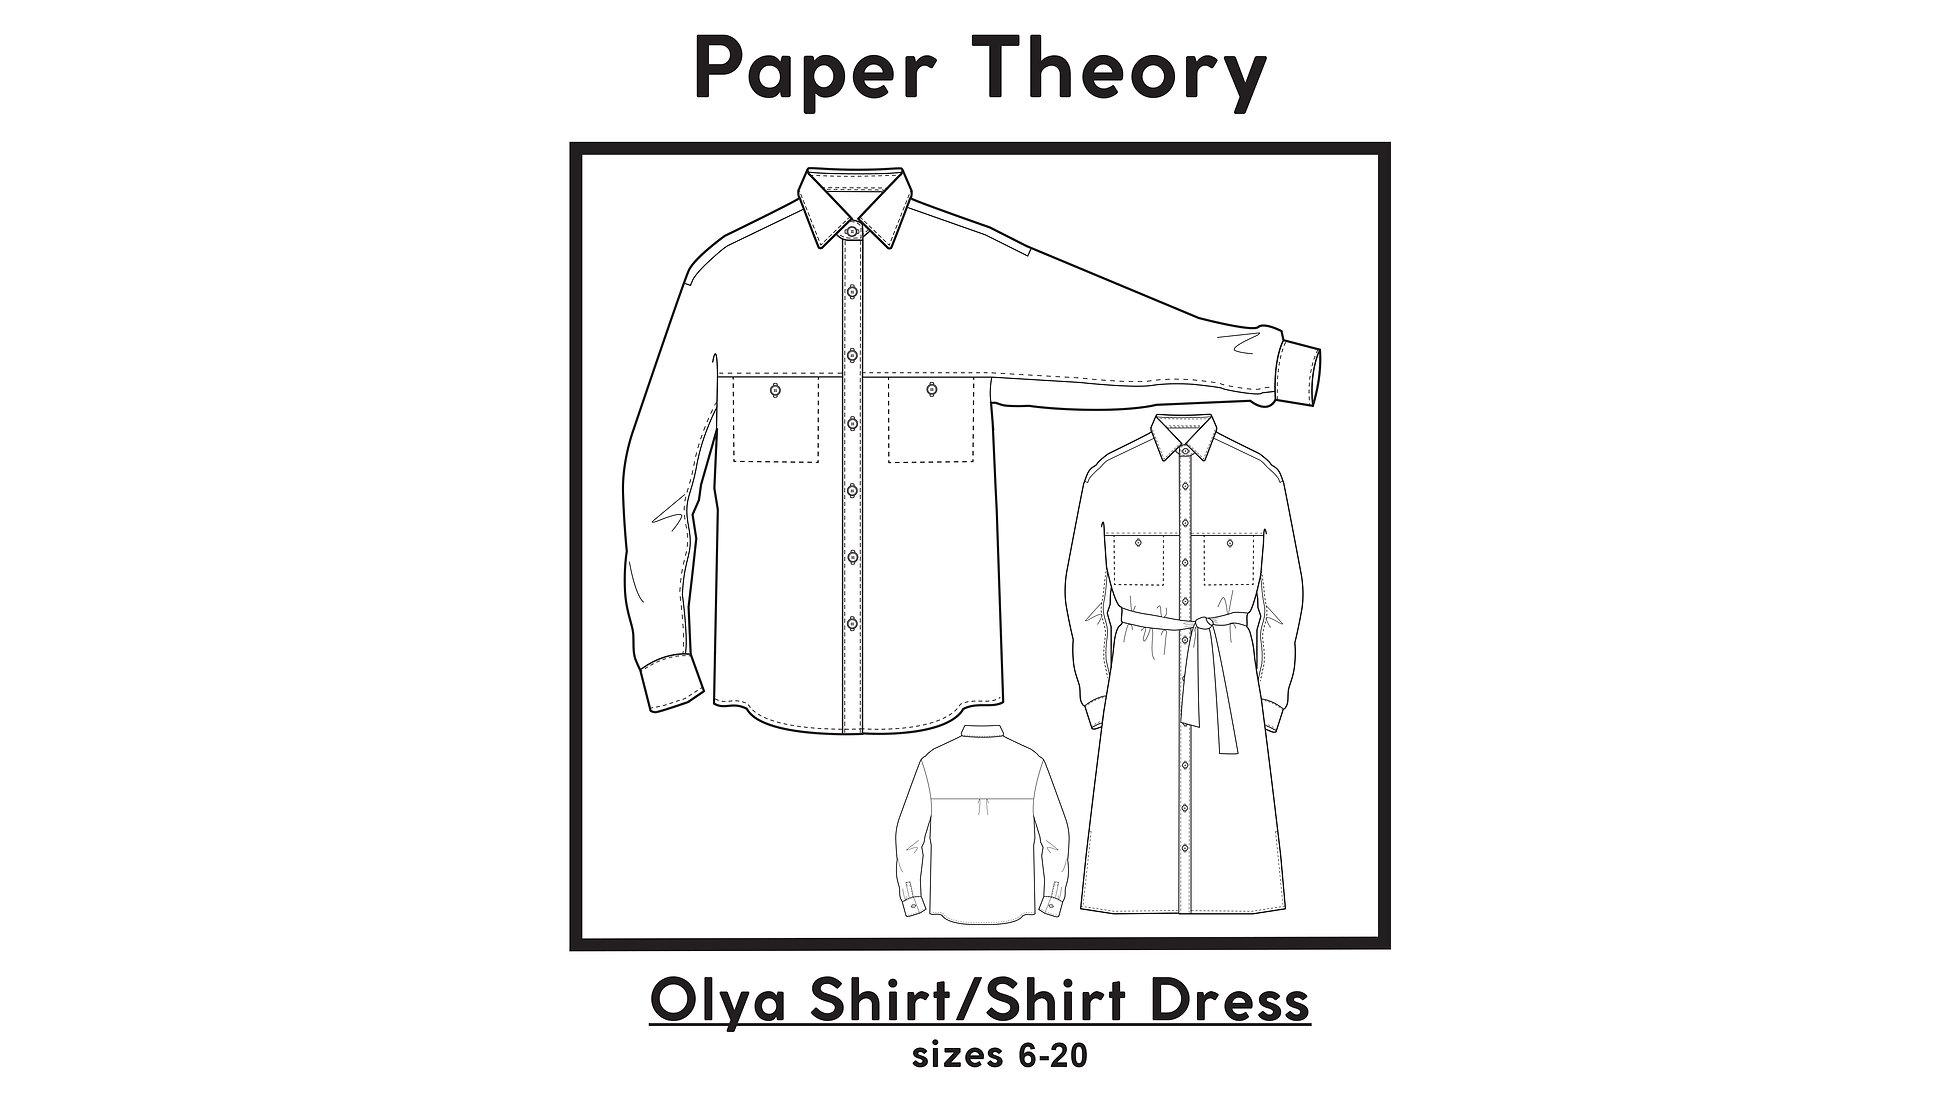 Olya Shirt / Shirt Dress PDF Pattern